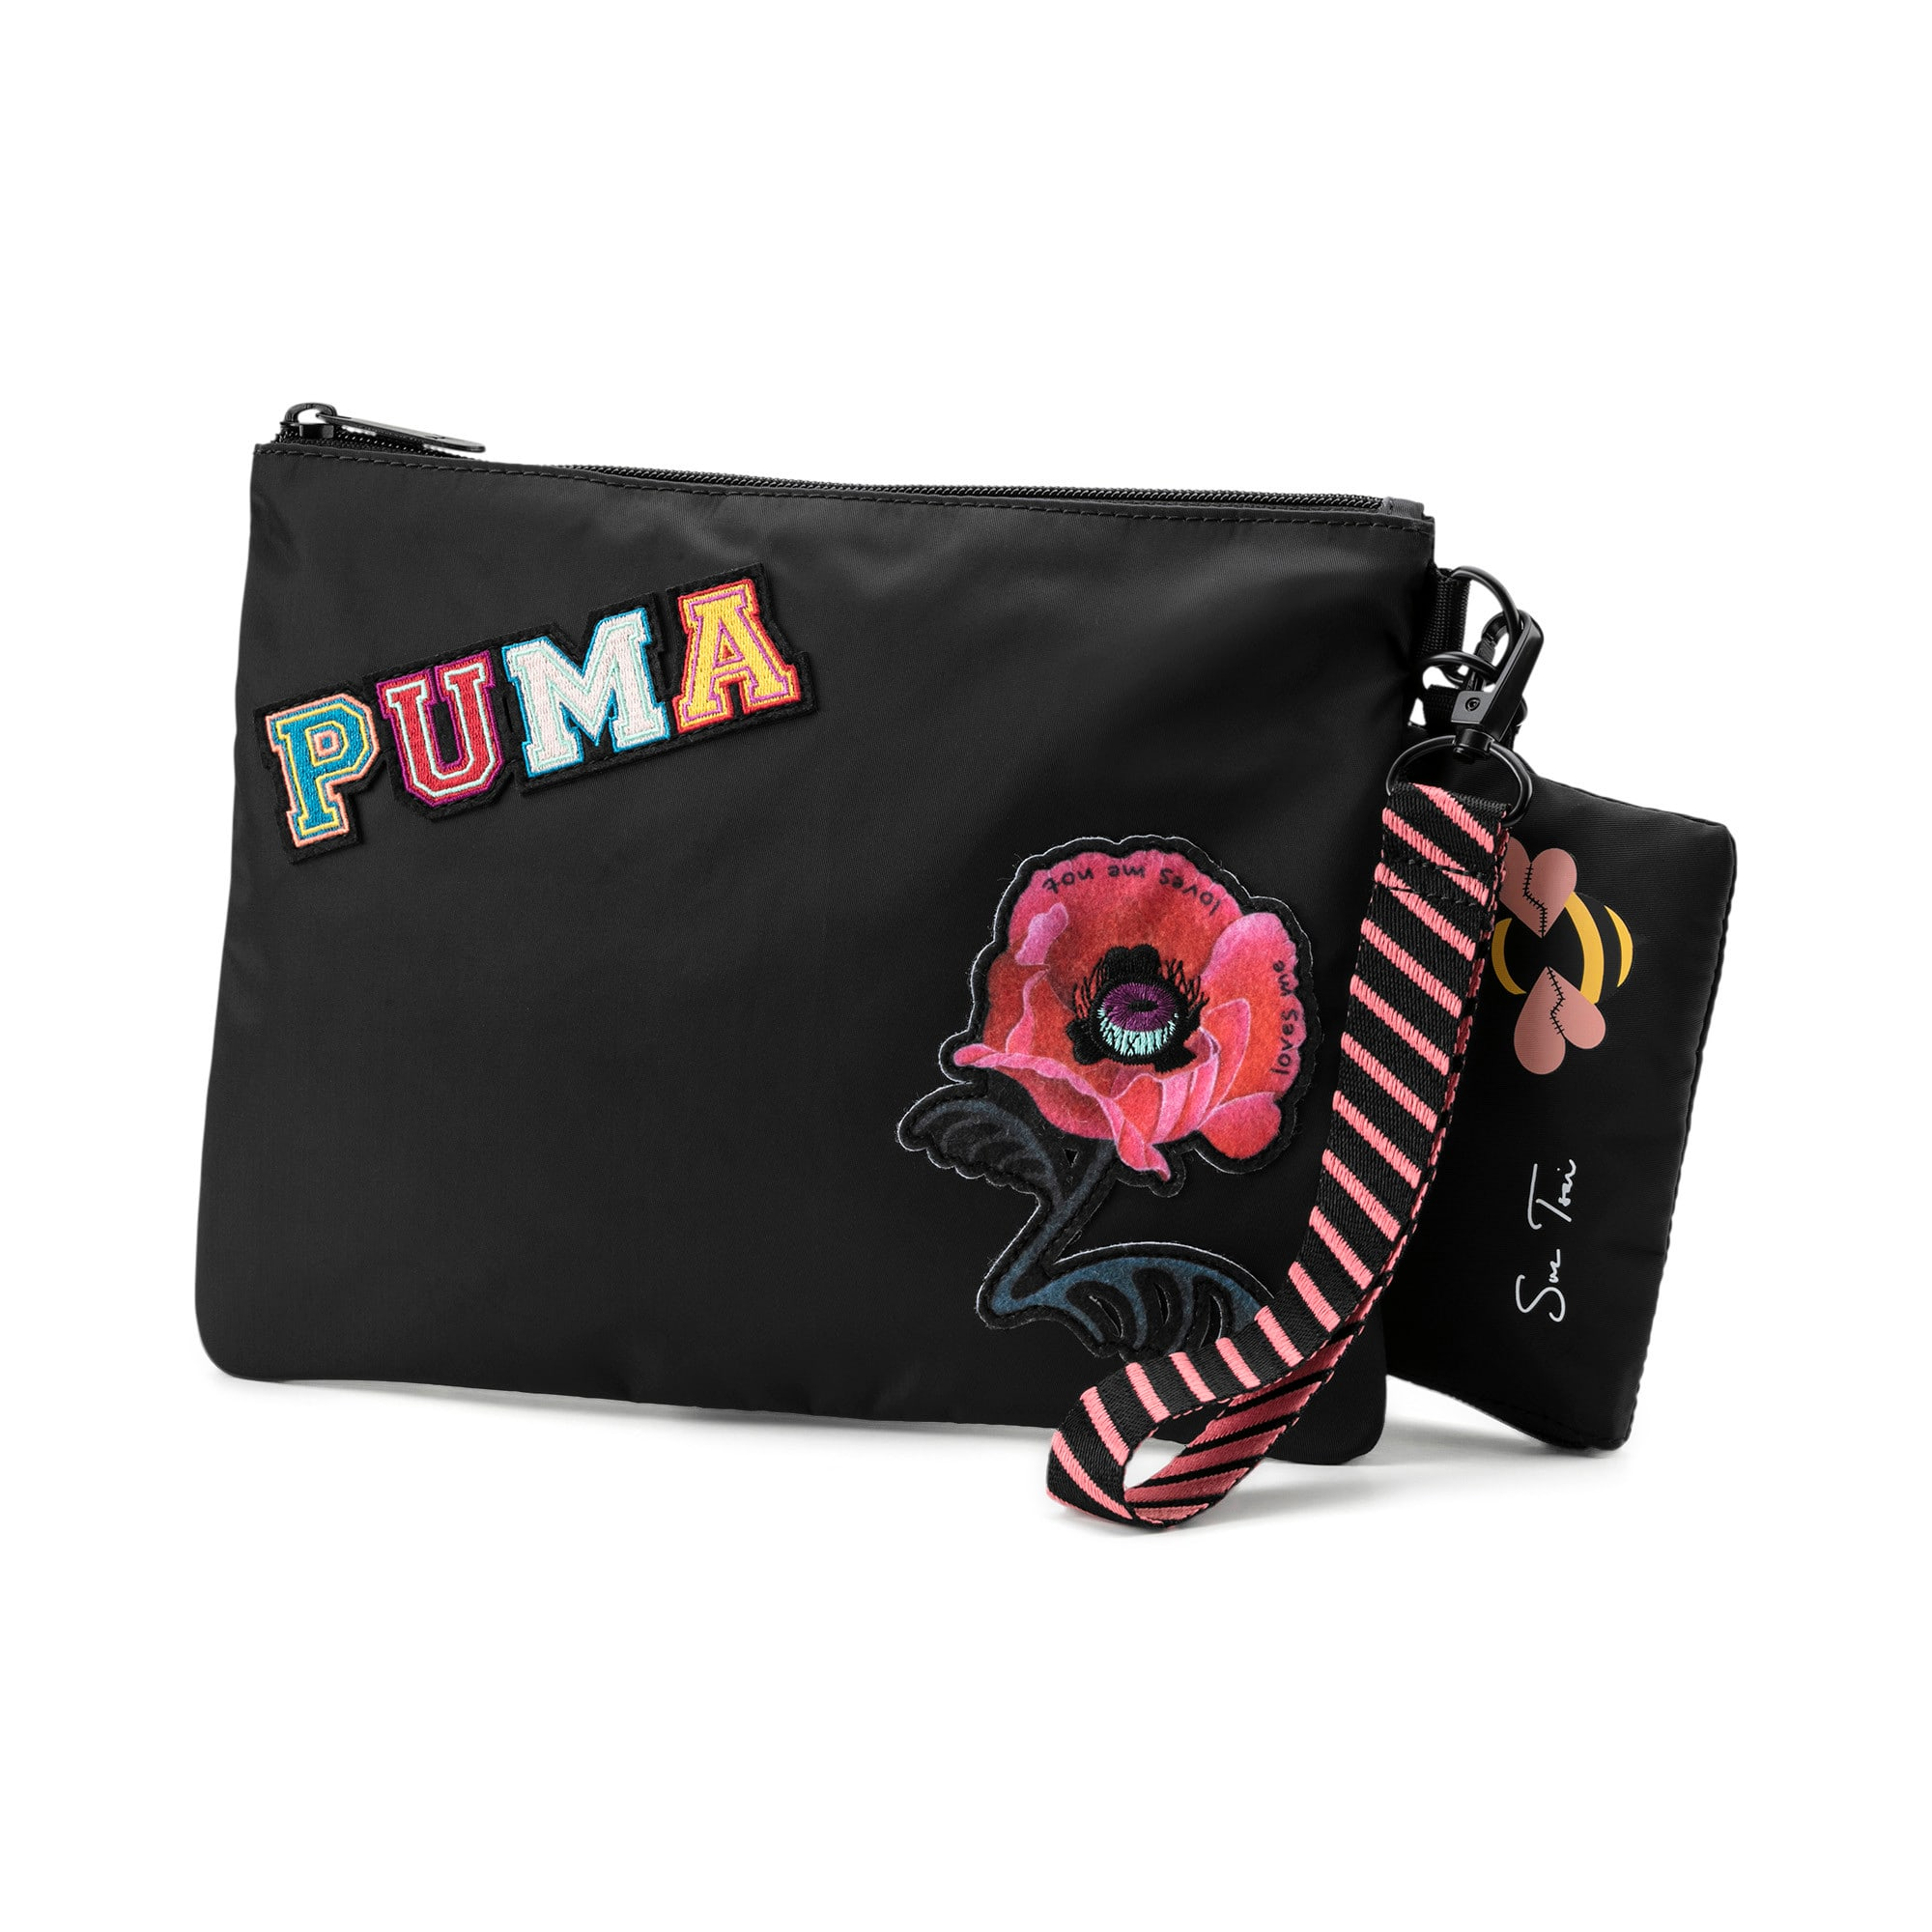 Thumbnail 1 of PUMA x Sue Tsai damesbuideltasje, Puma Black, medium